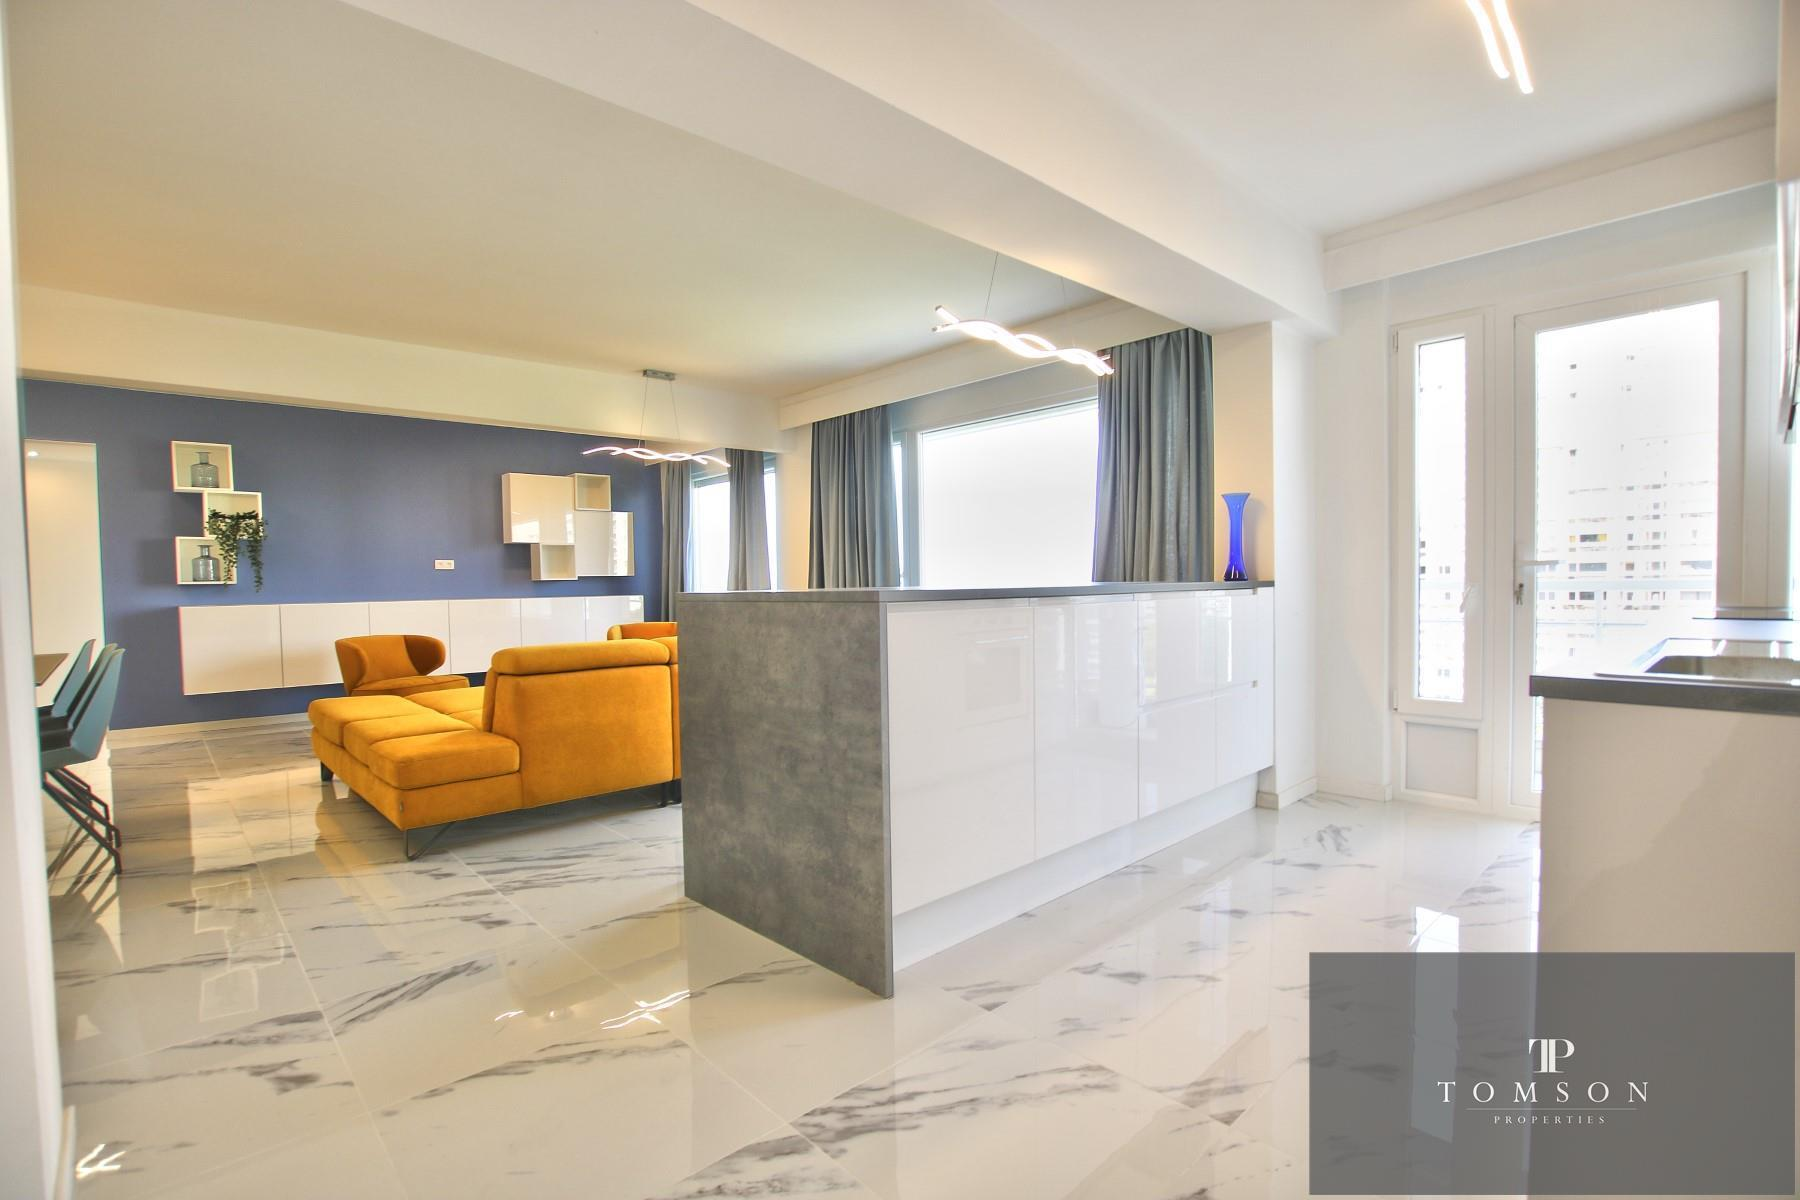 Appartement - Woluwe-Saint-Lambert - #4530510-3